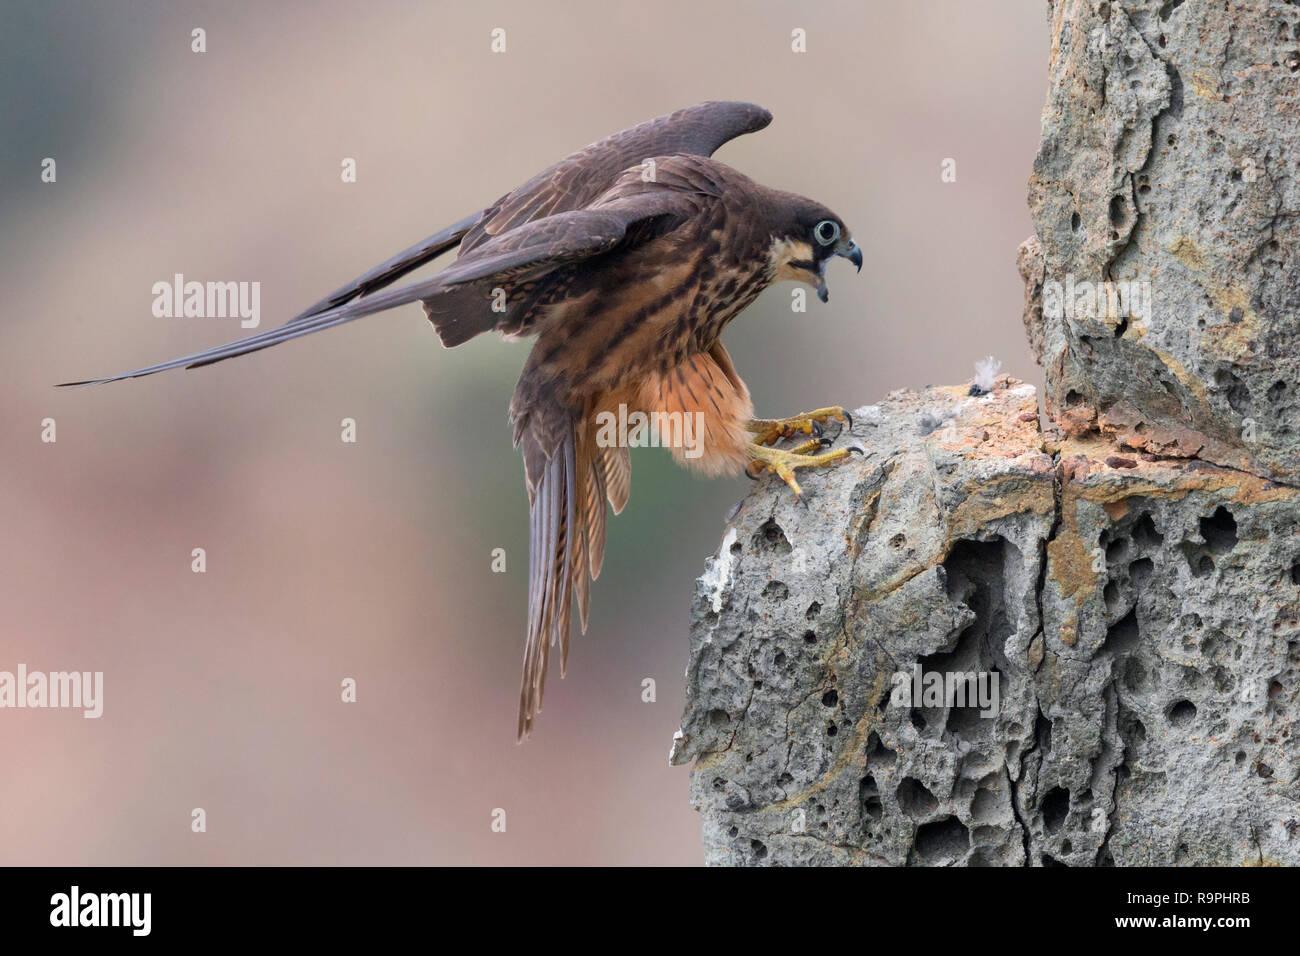 Eleonorenfalken (Falco eleonorae), leichte Morph nach Landung auf einem Felsen Stockbild